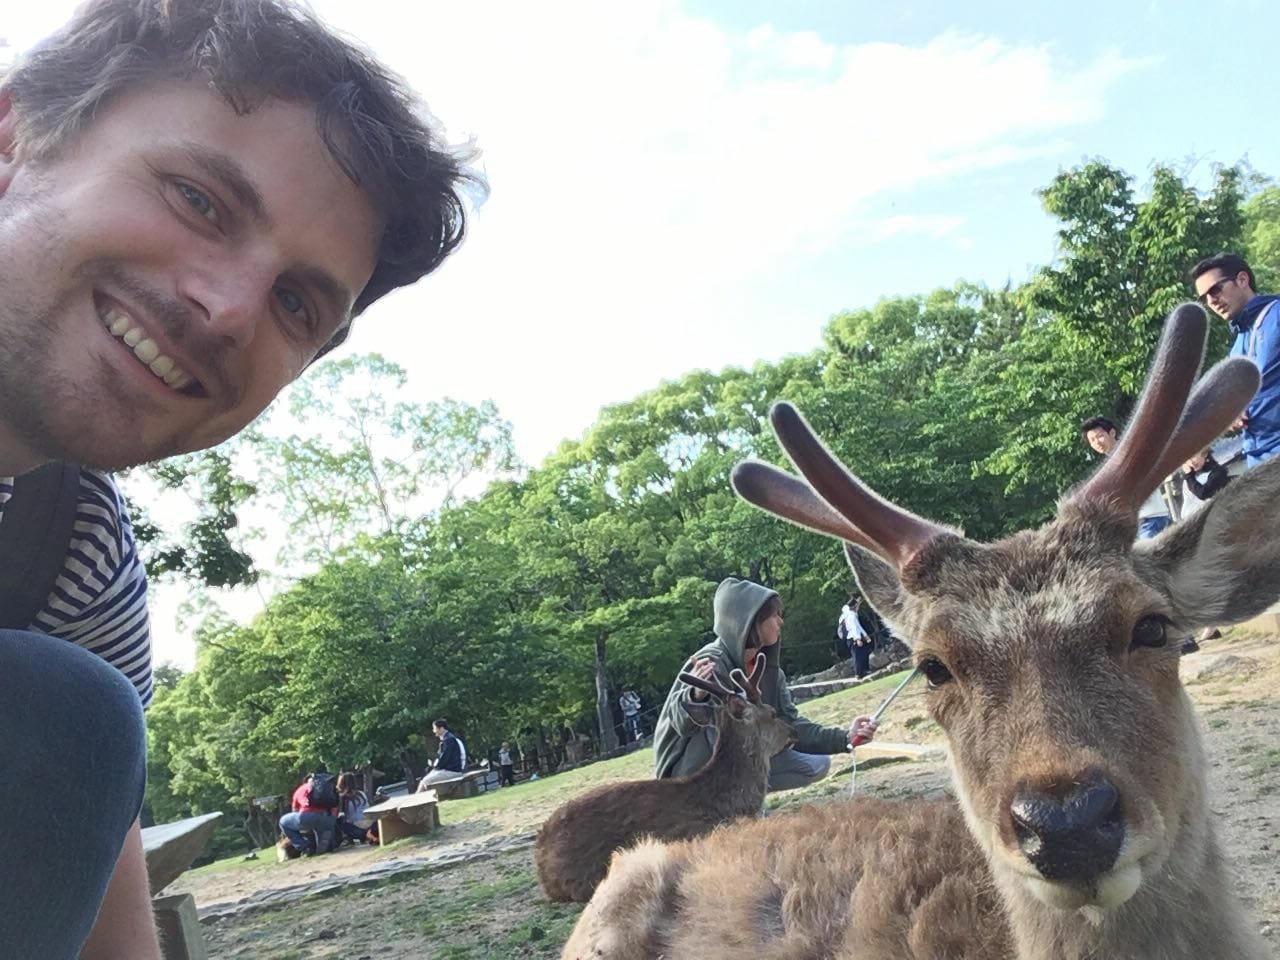 Justus and a reindeer